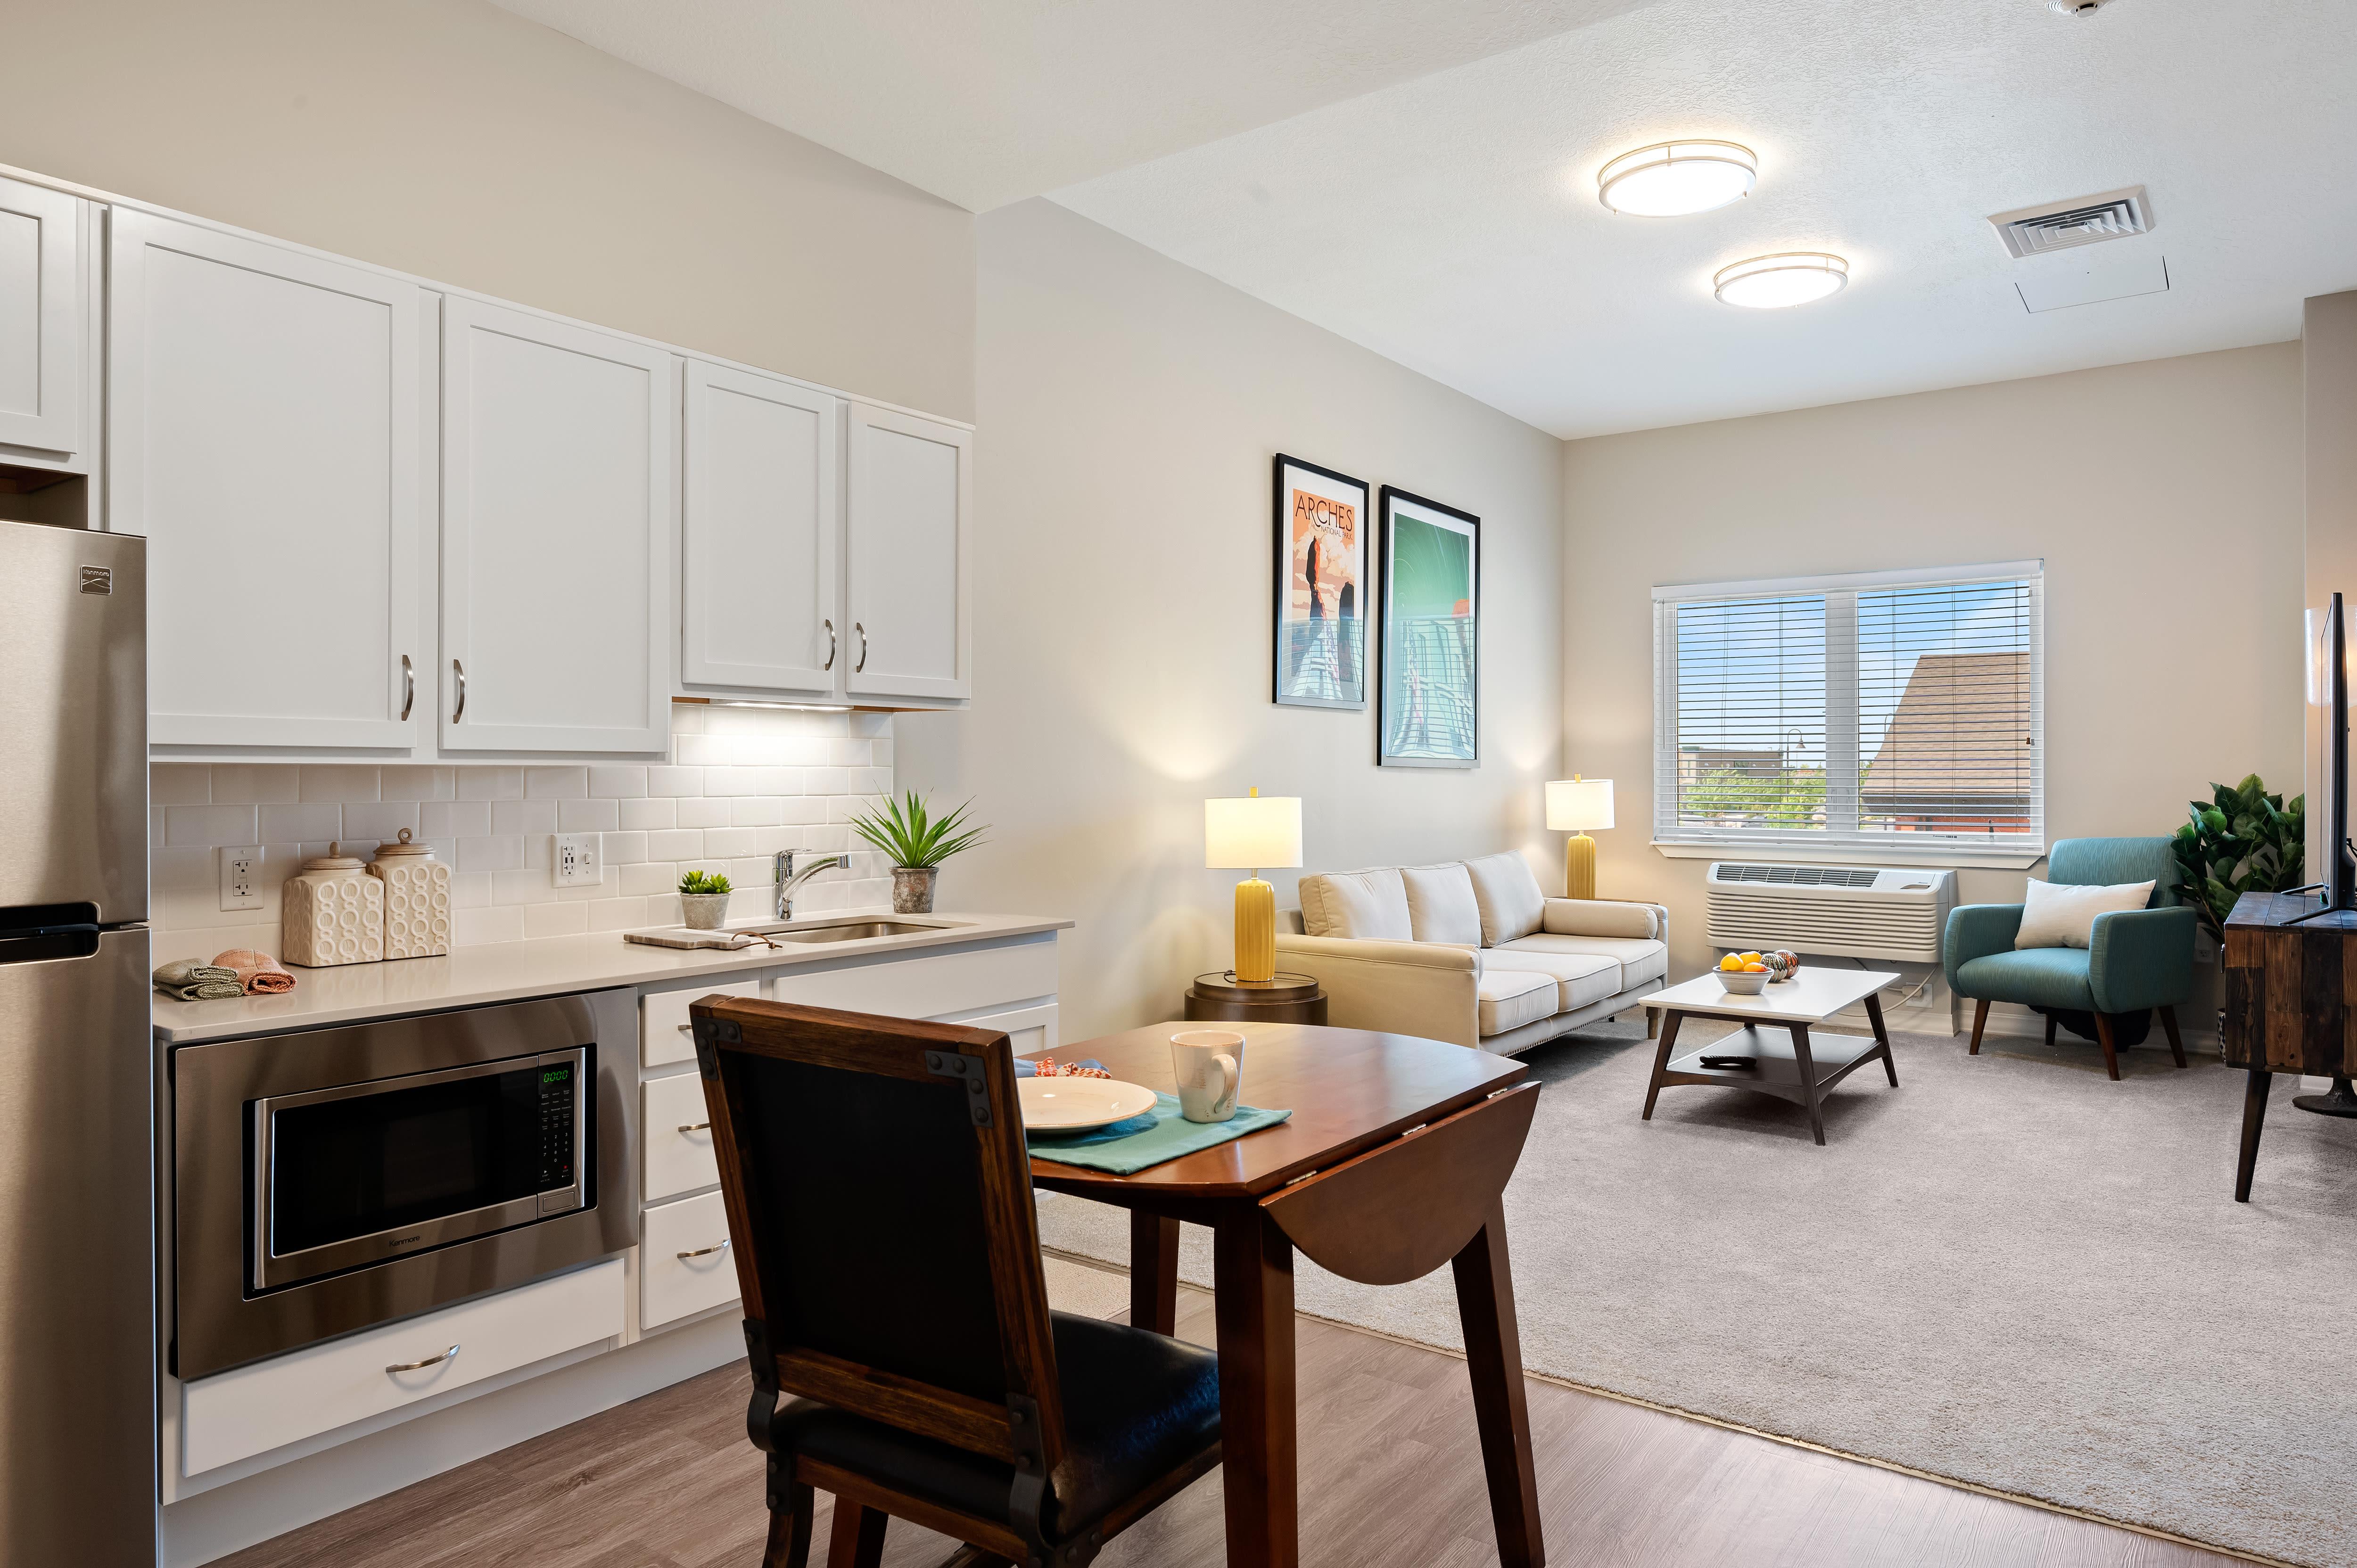 A spacious resident apartment at Anthology of South Jordan in South Jordan, Utah